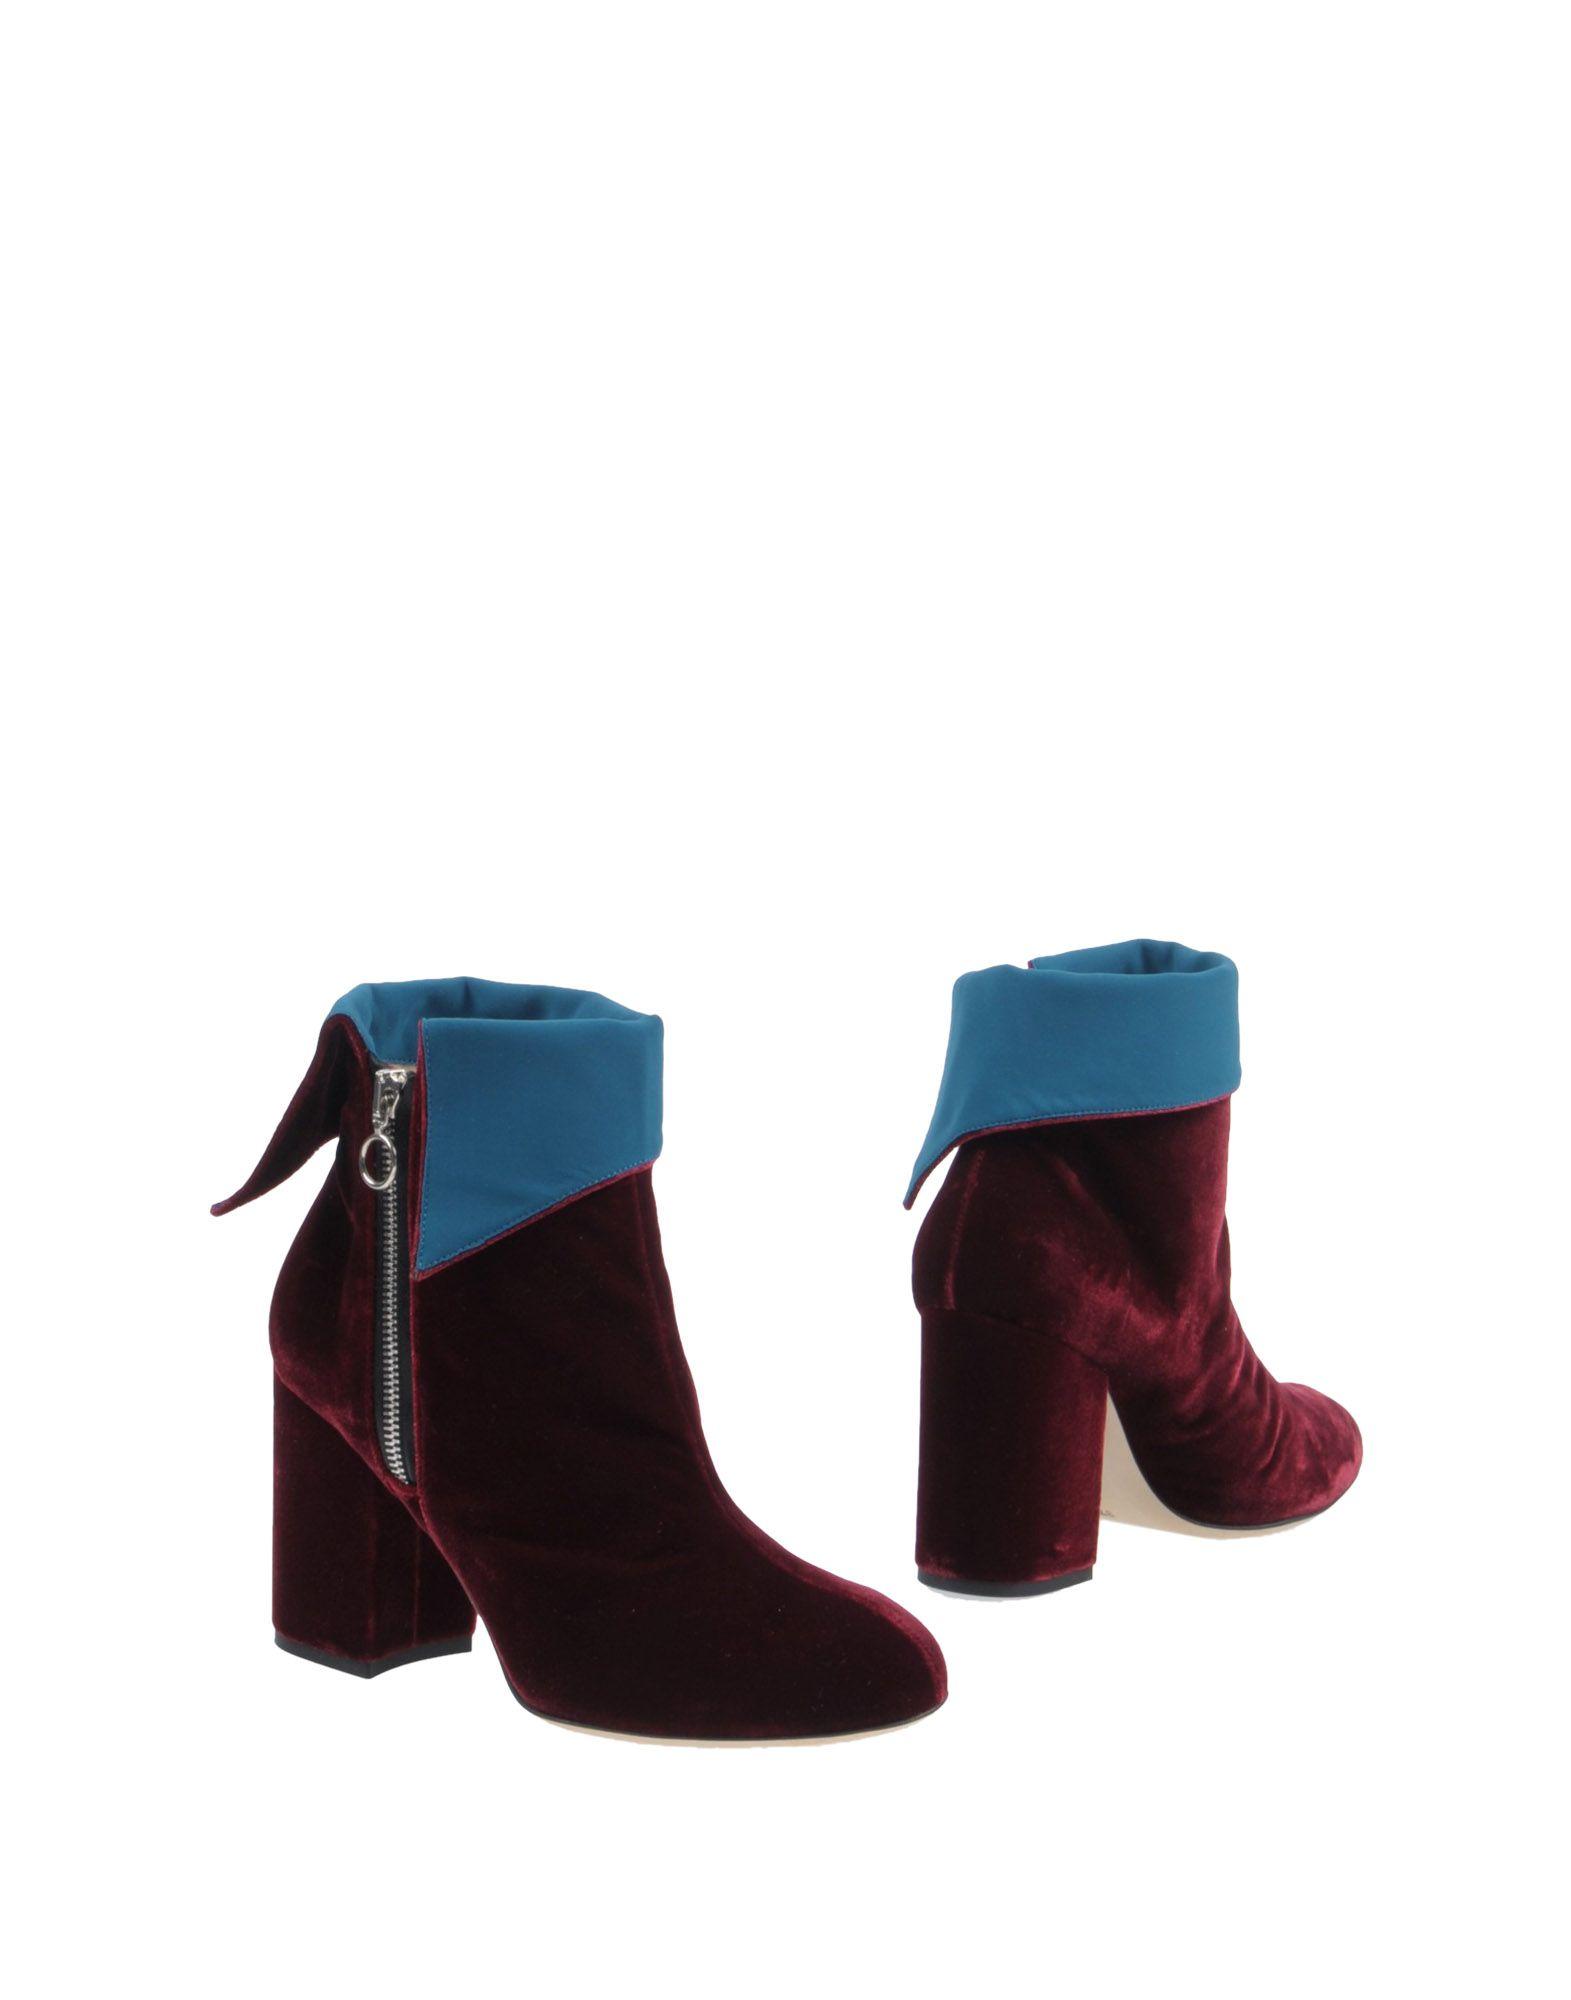 CHIARA BONI Ankle Boot in Maroon